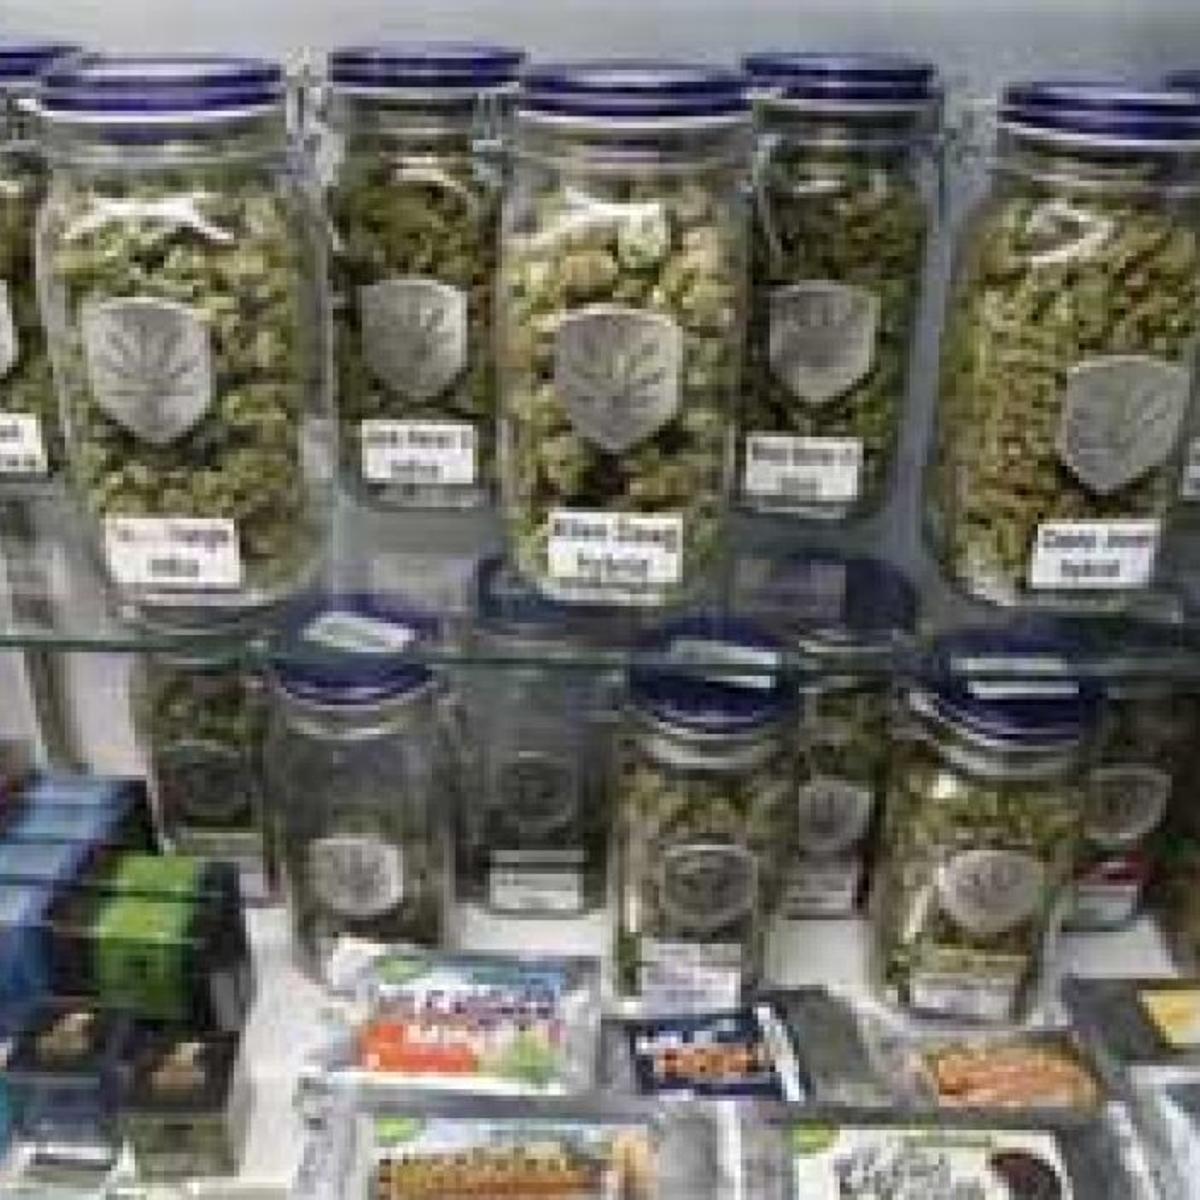 Want to open a marijuana dispensary in Illinois? It will